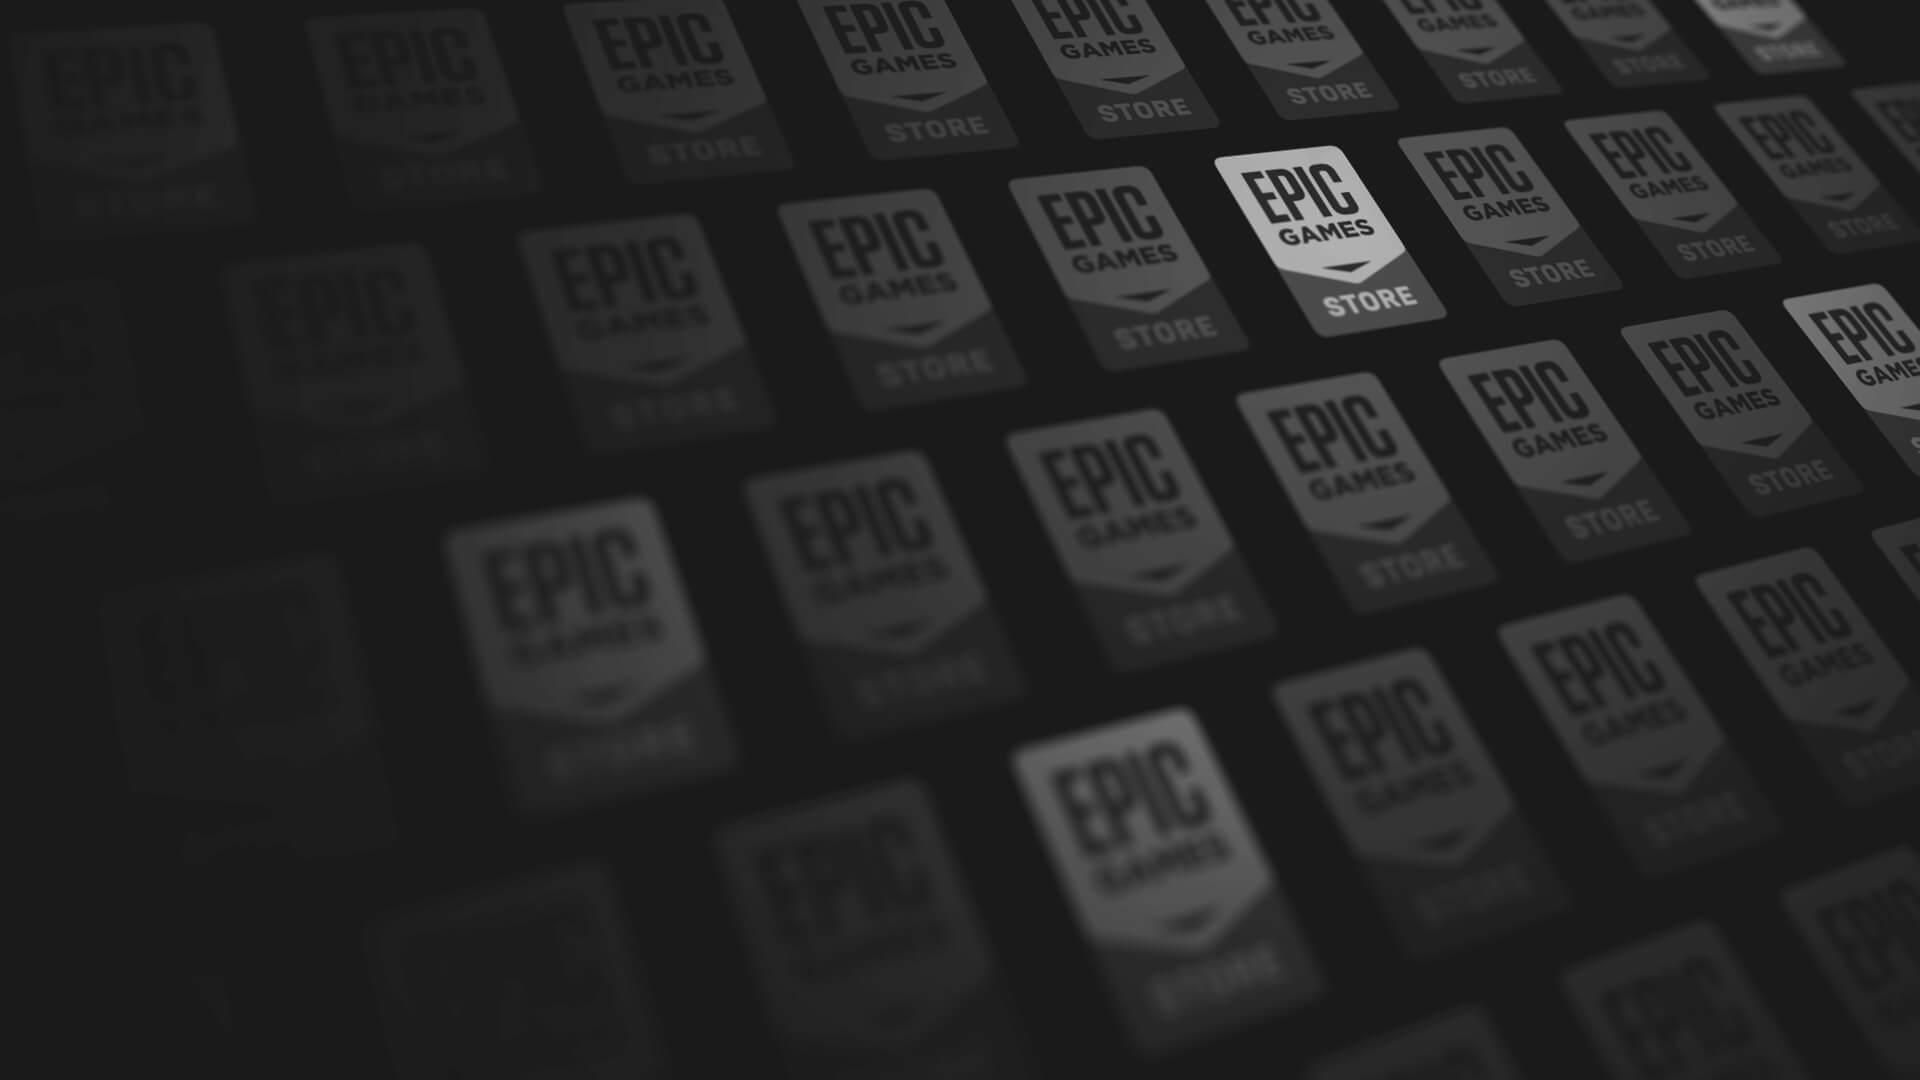 Tim Sweeney quiere llevar la Epic Games Store a Android y iOS 30